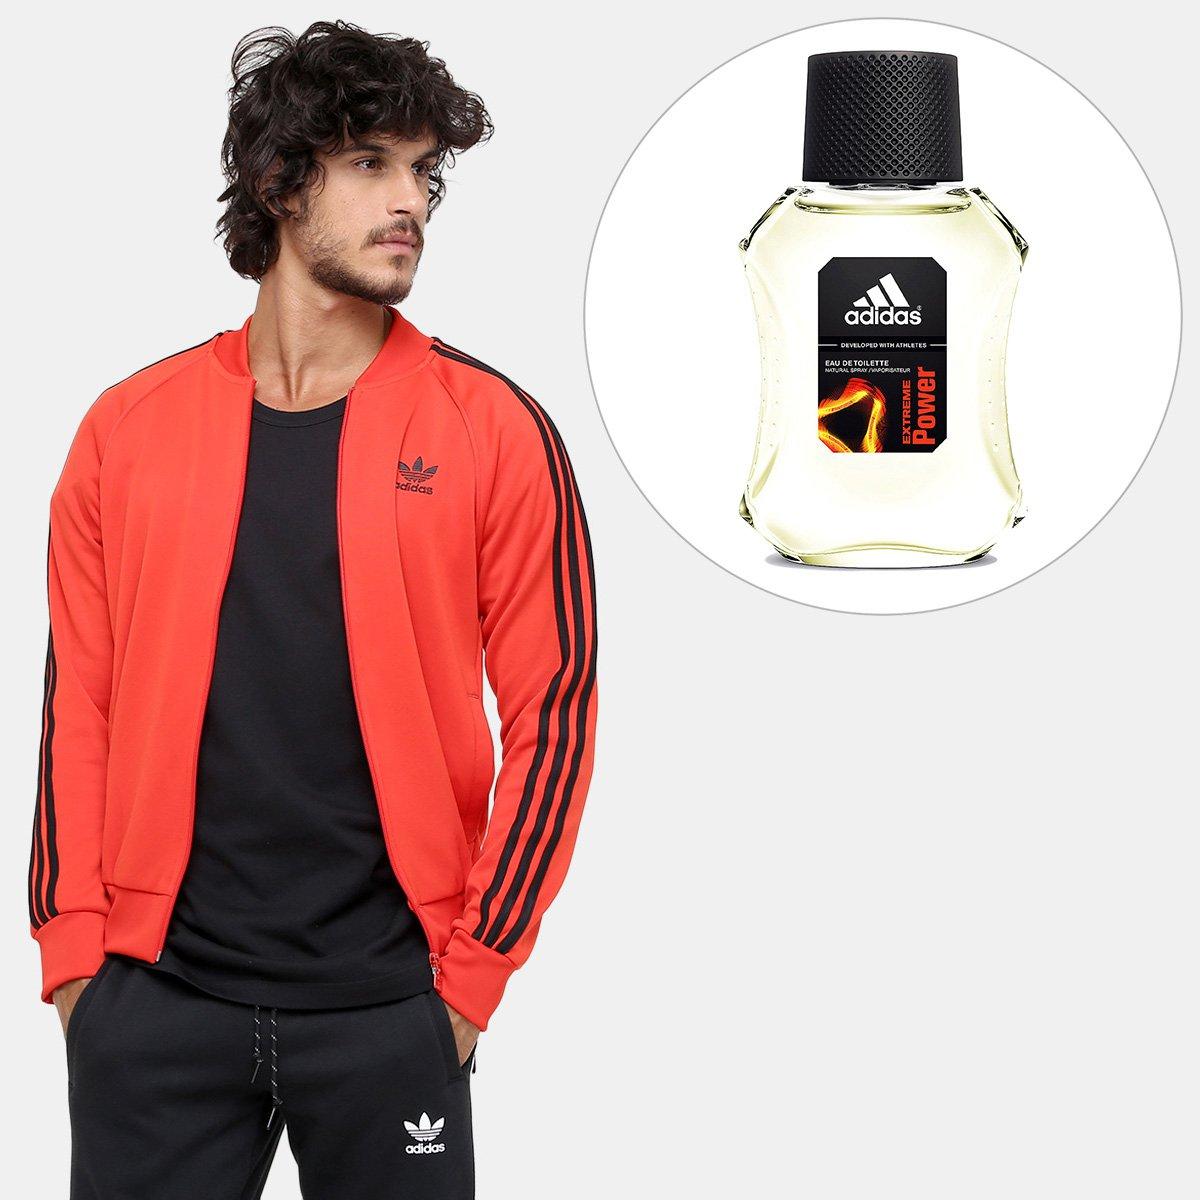 e42dd810bb4 Kit Dia dos Pais Jaqueta Adidas Sst TT + Perfume Adidas Extreme Power EDT  50ml - Compre Agora